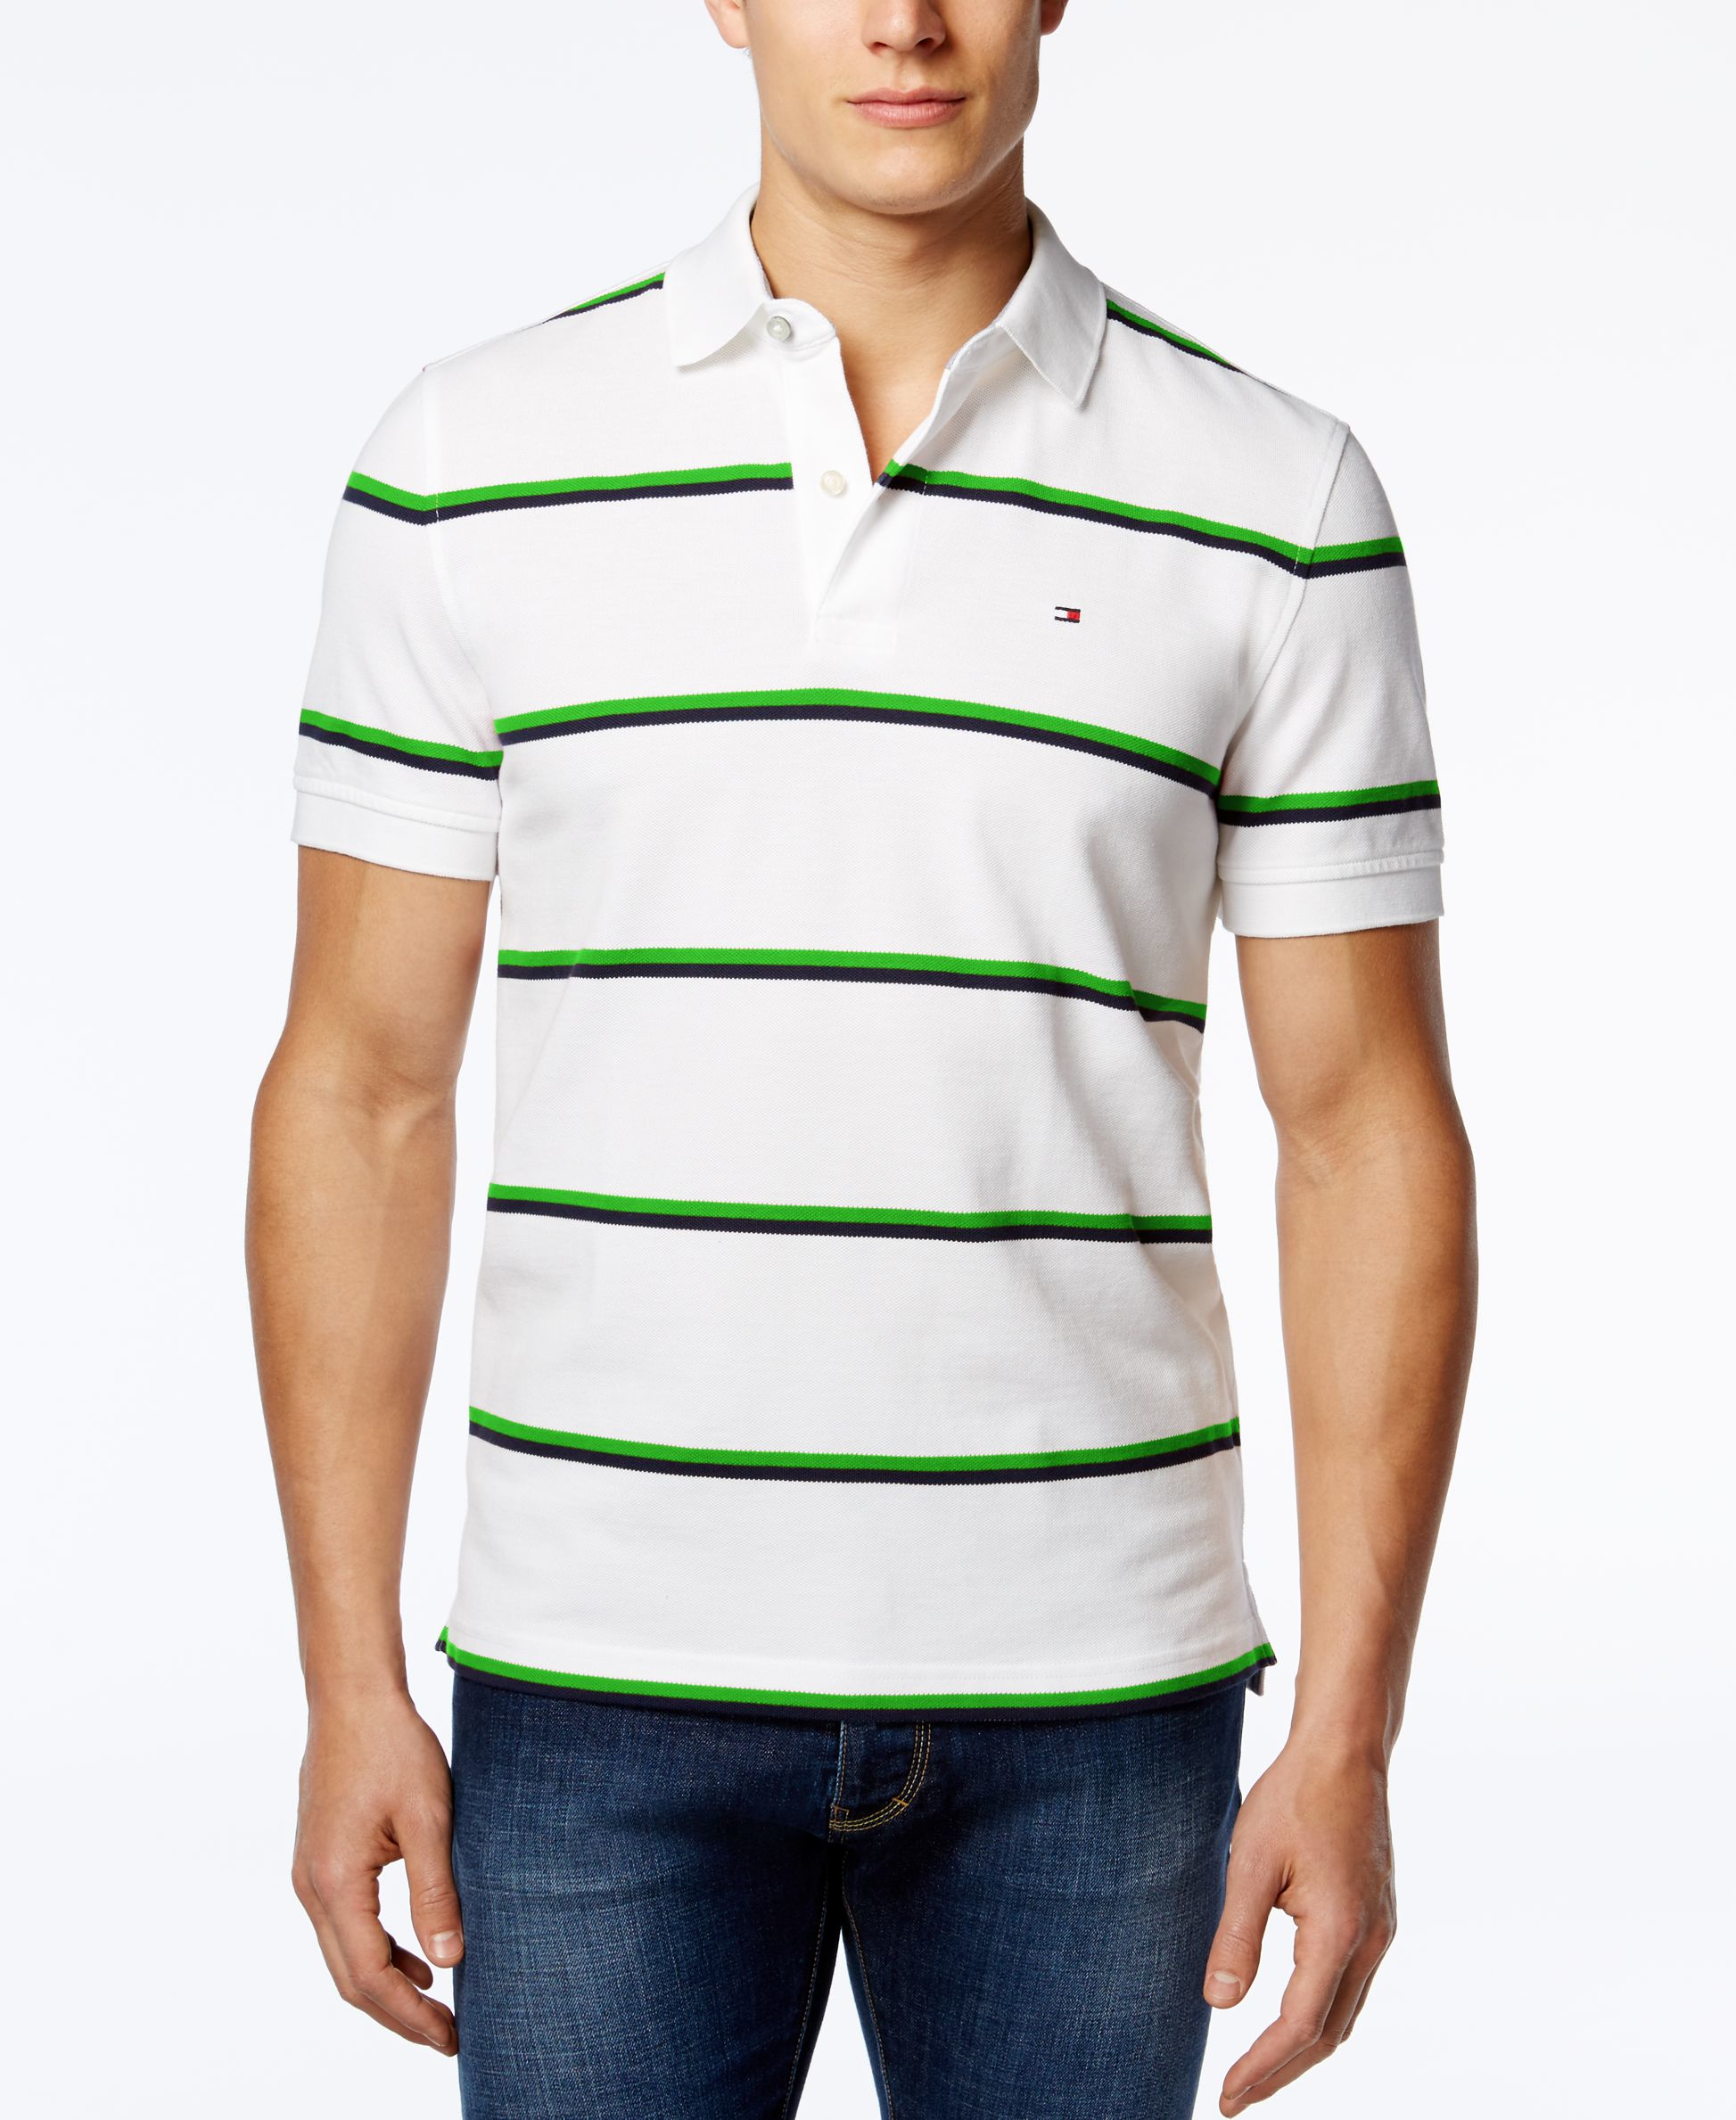 Mens Penguin Polo Shirts Images. Mens Polo Shirts And ...